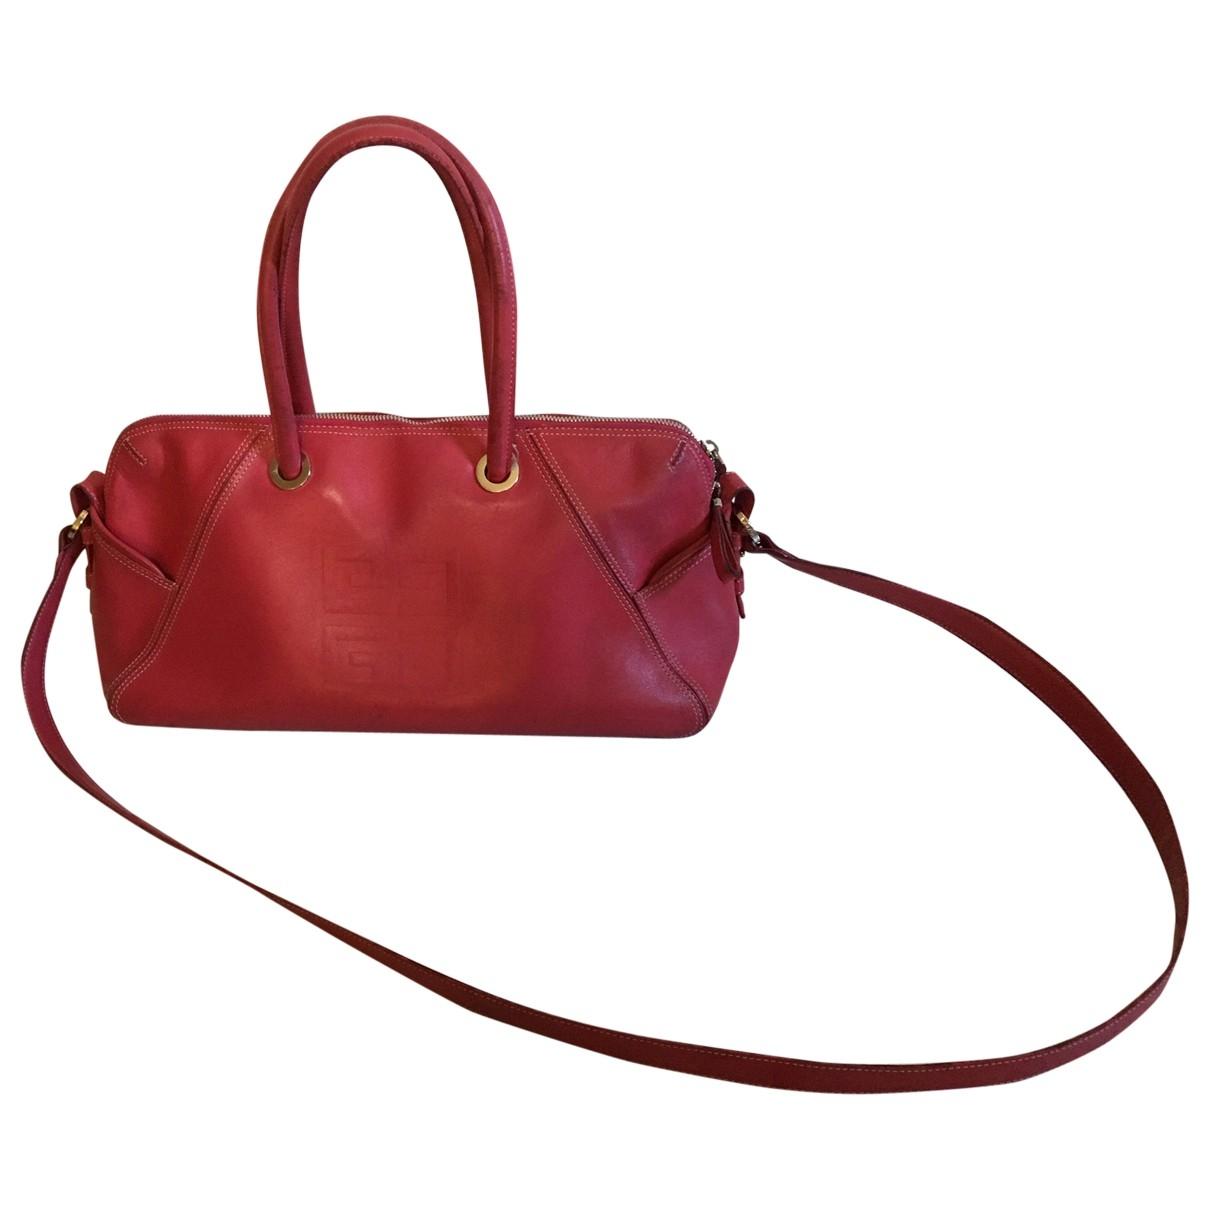 Givenchy - Sac a main   pour femme en cuir